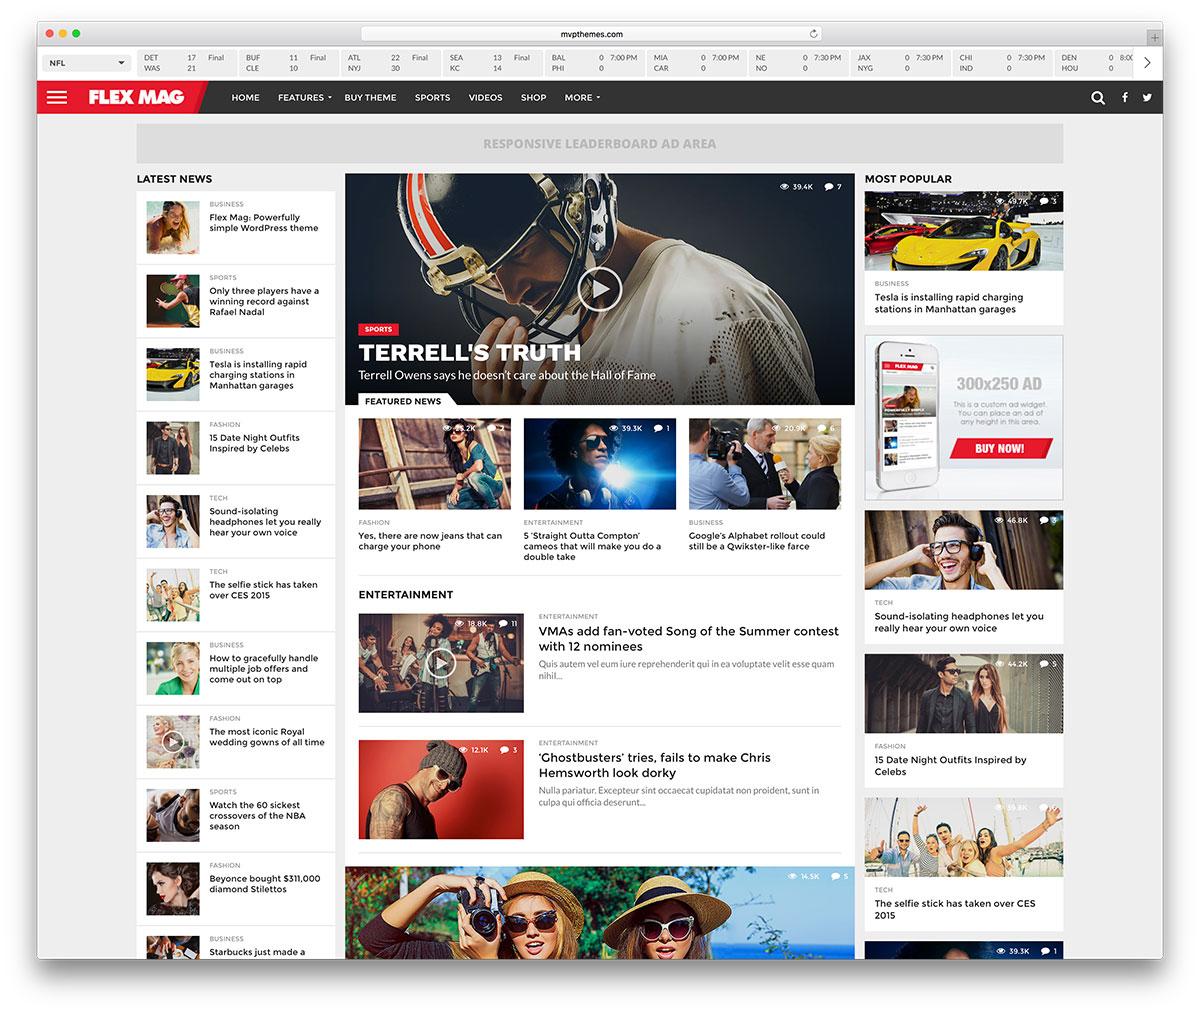 40 Best Newsmagazine Wordpress Themes For 2016